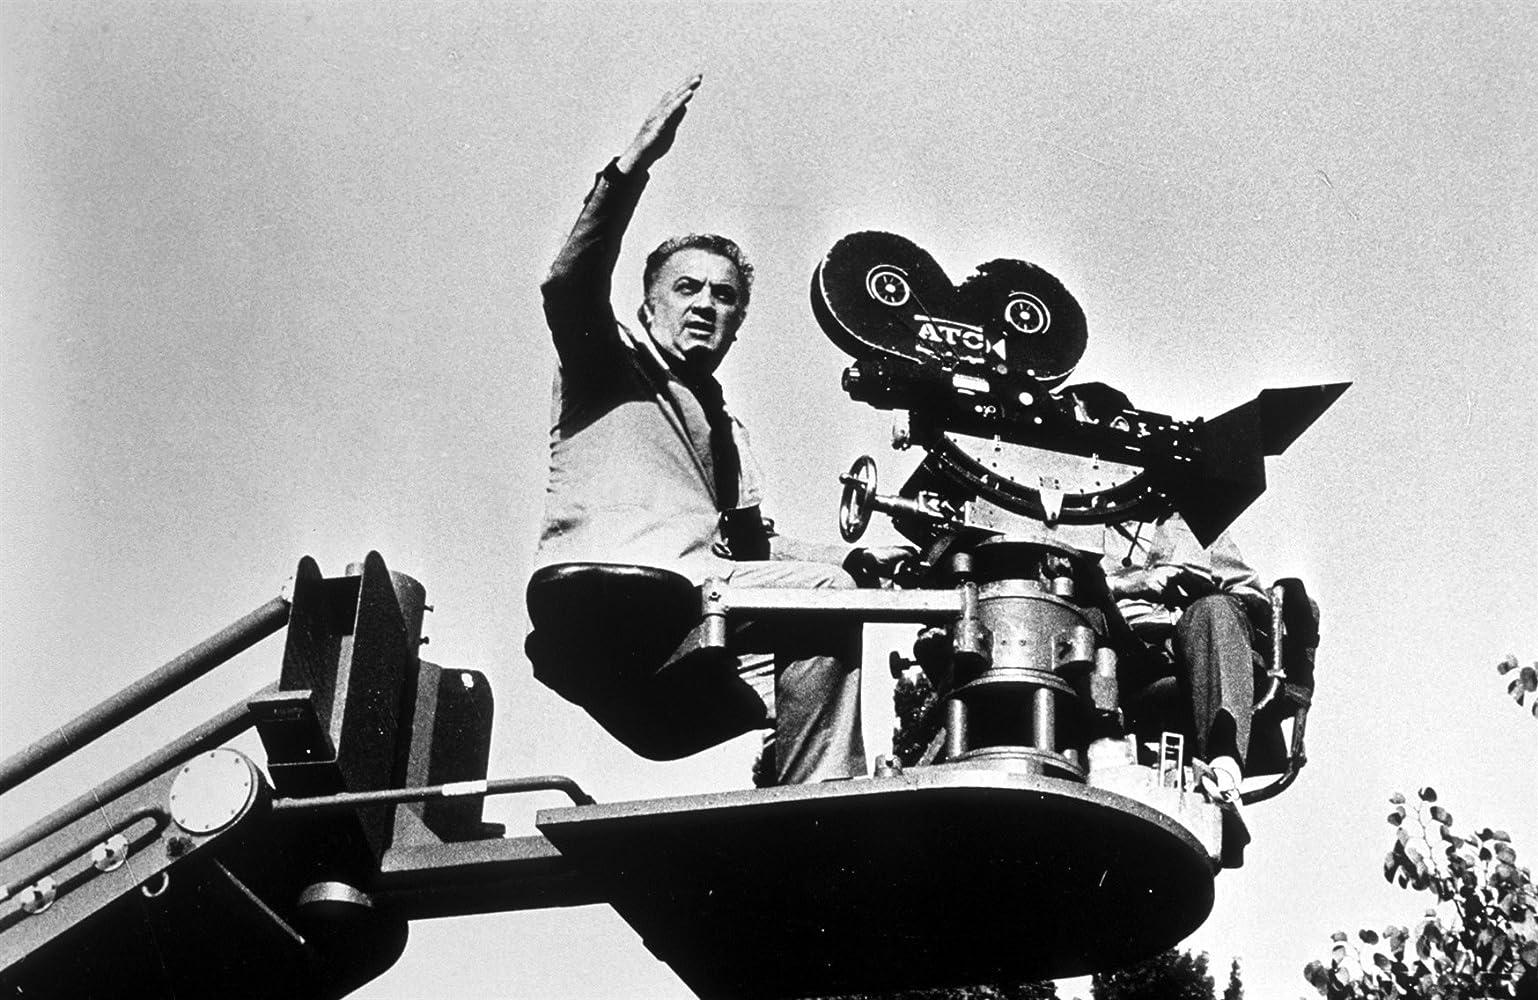 Federico Fellini and G.B. Poletto